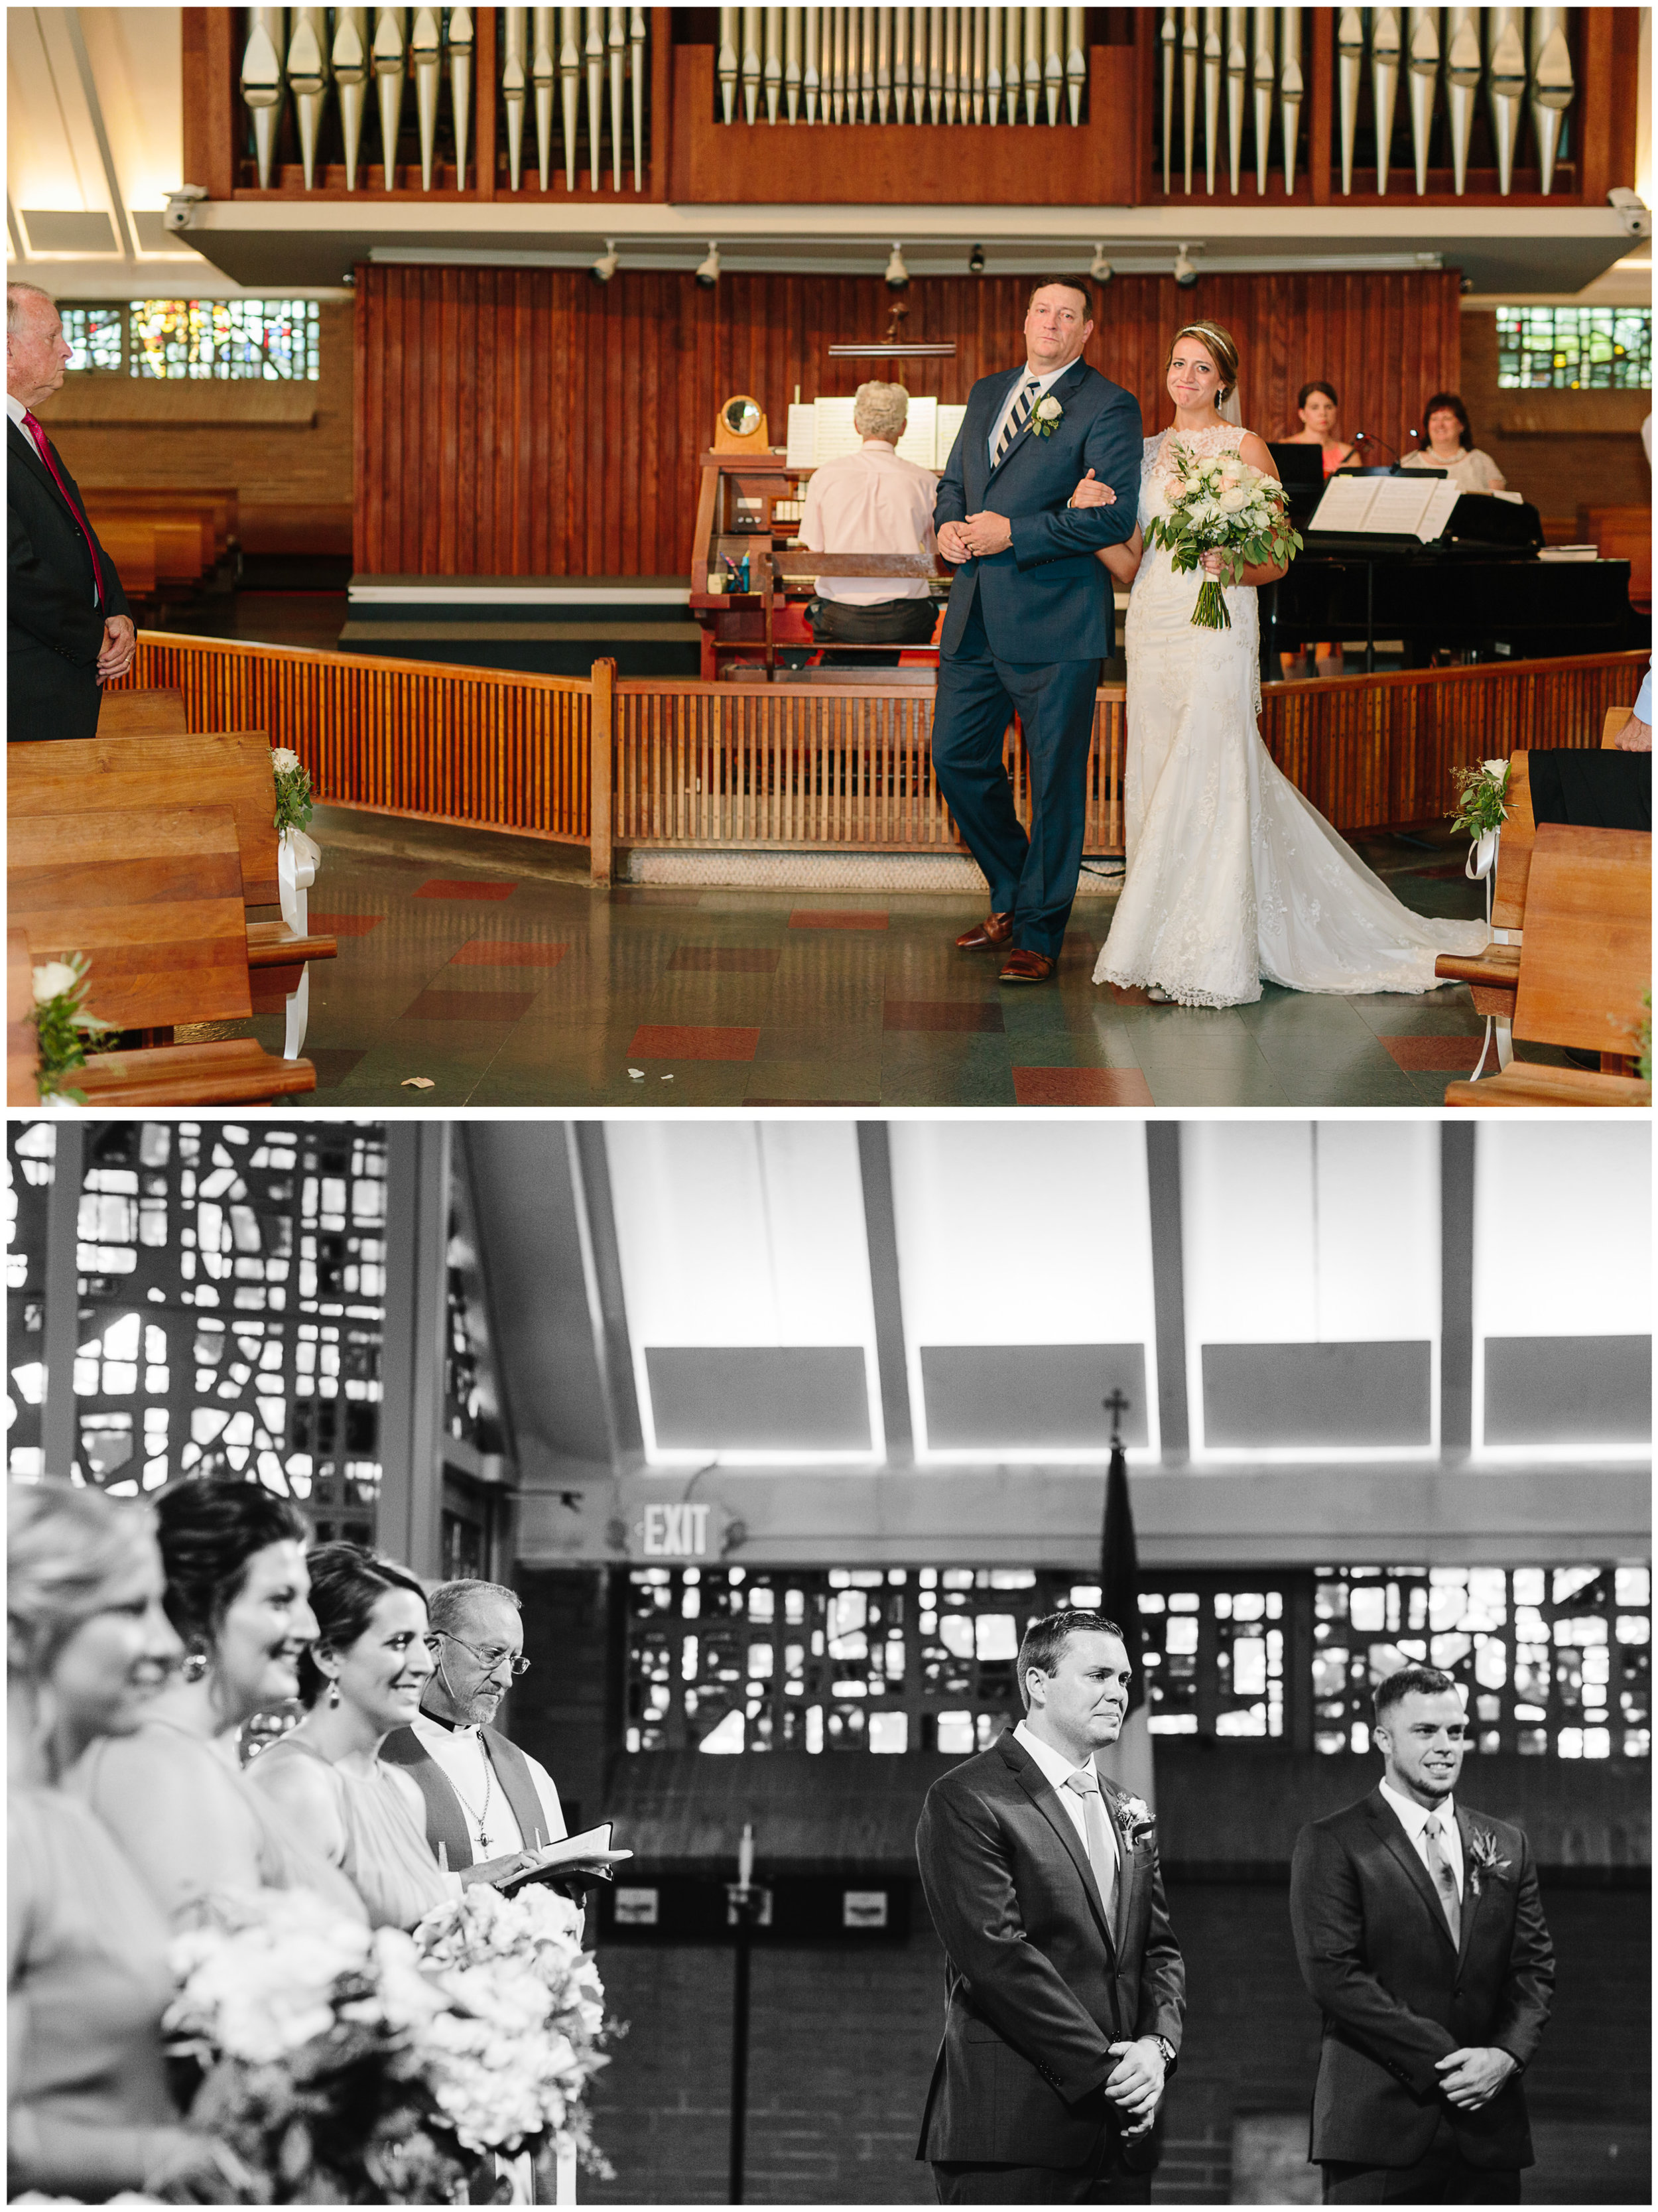 ann_arbor_michigan_wedding_62.jpg